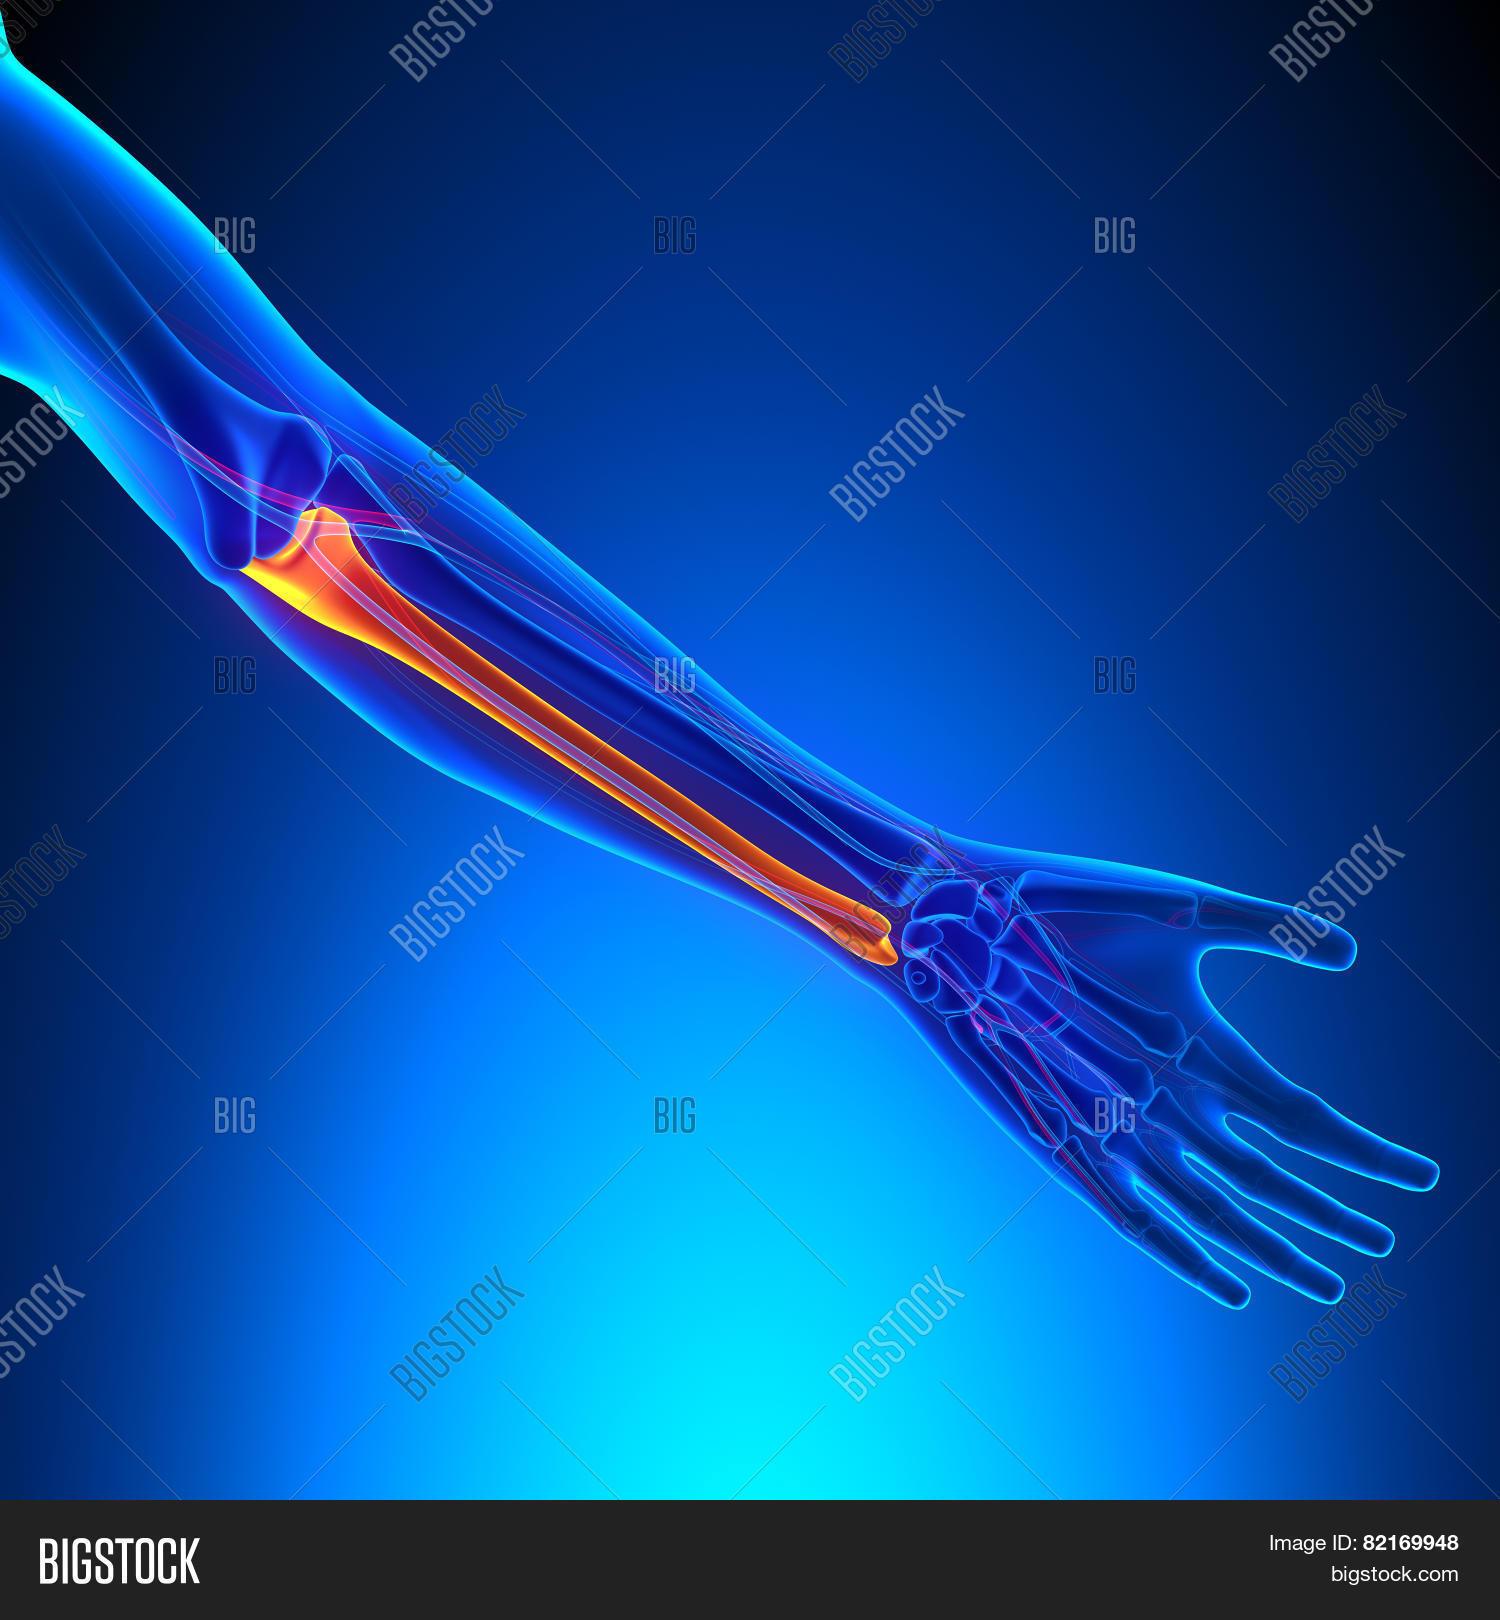 Ulna Bone Anatomy Image & Photo (Free Trial) | Bigstock